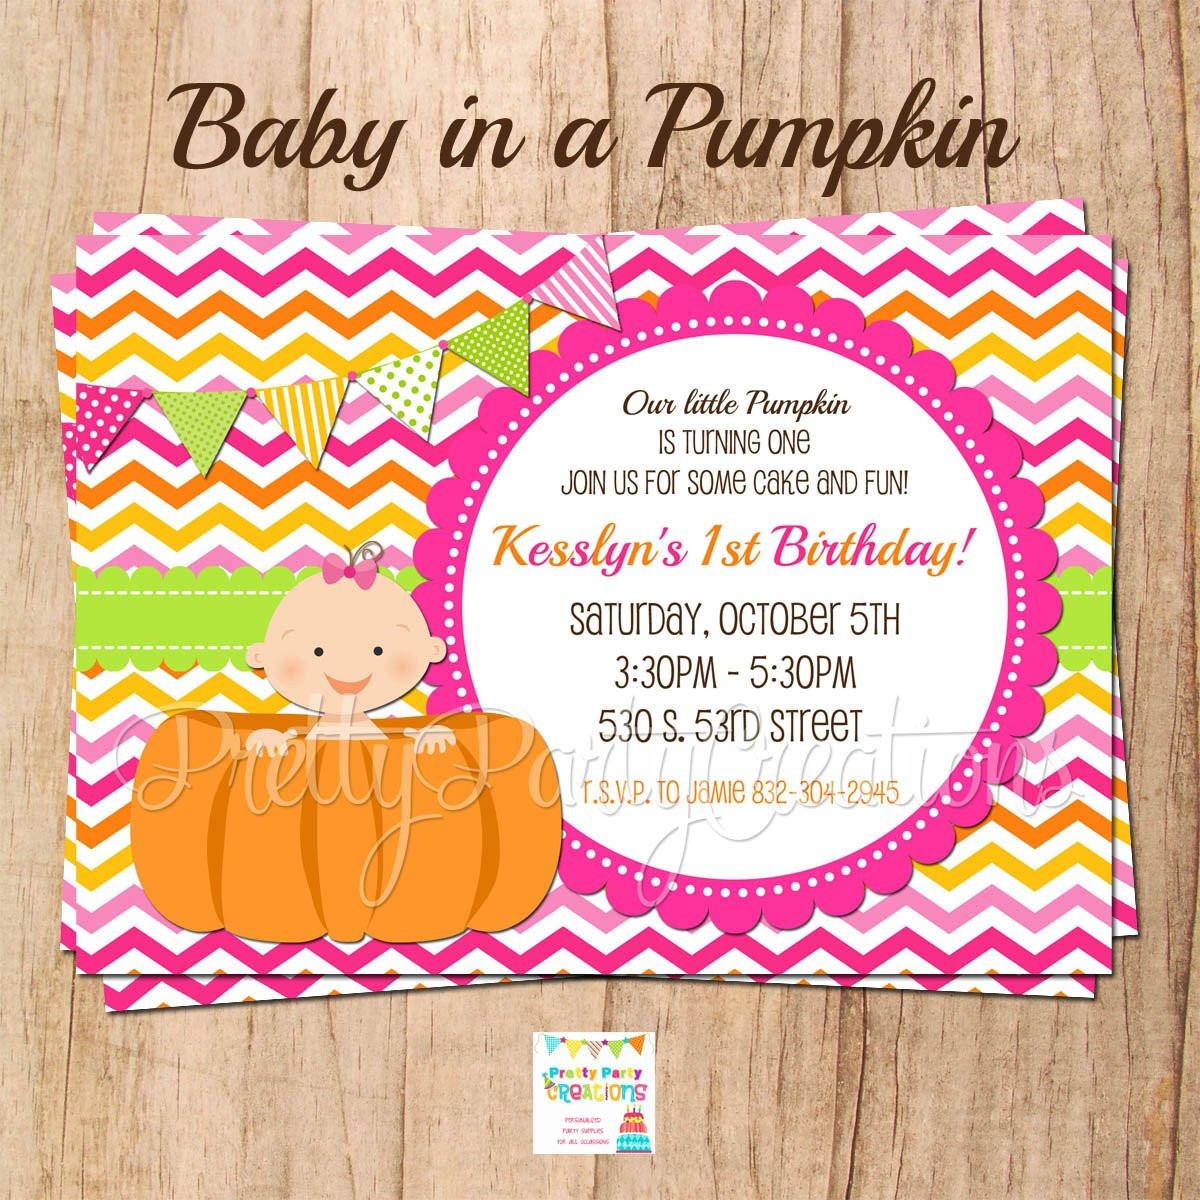 Pumpkin First Birthday Invitations  BABY in PUMPKIN 1st birthday or baby shower invitation with